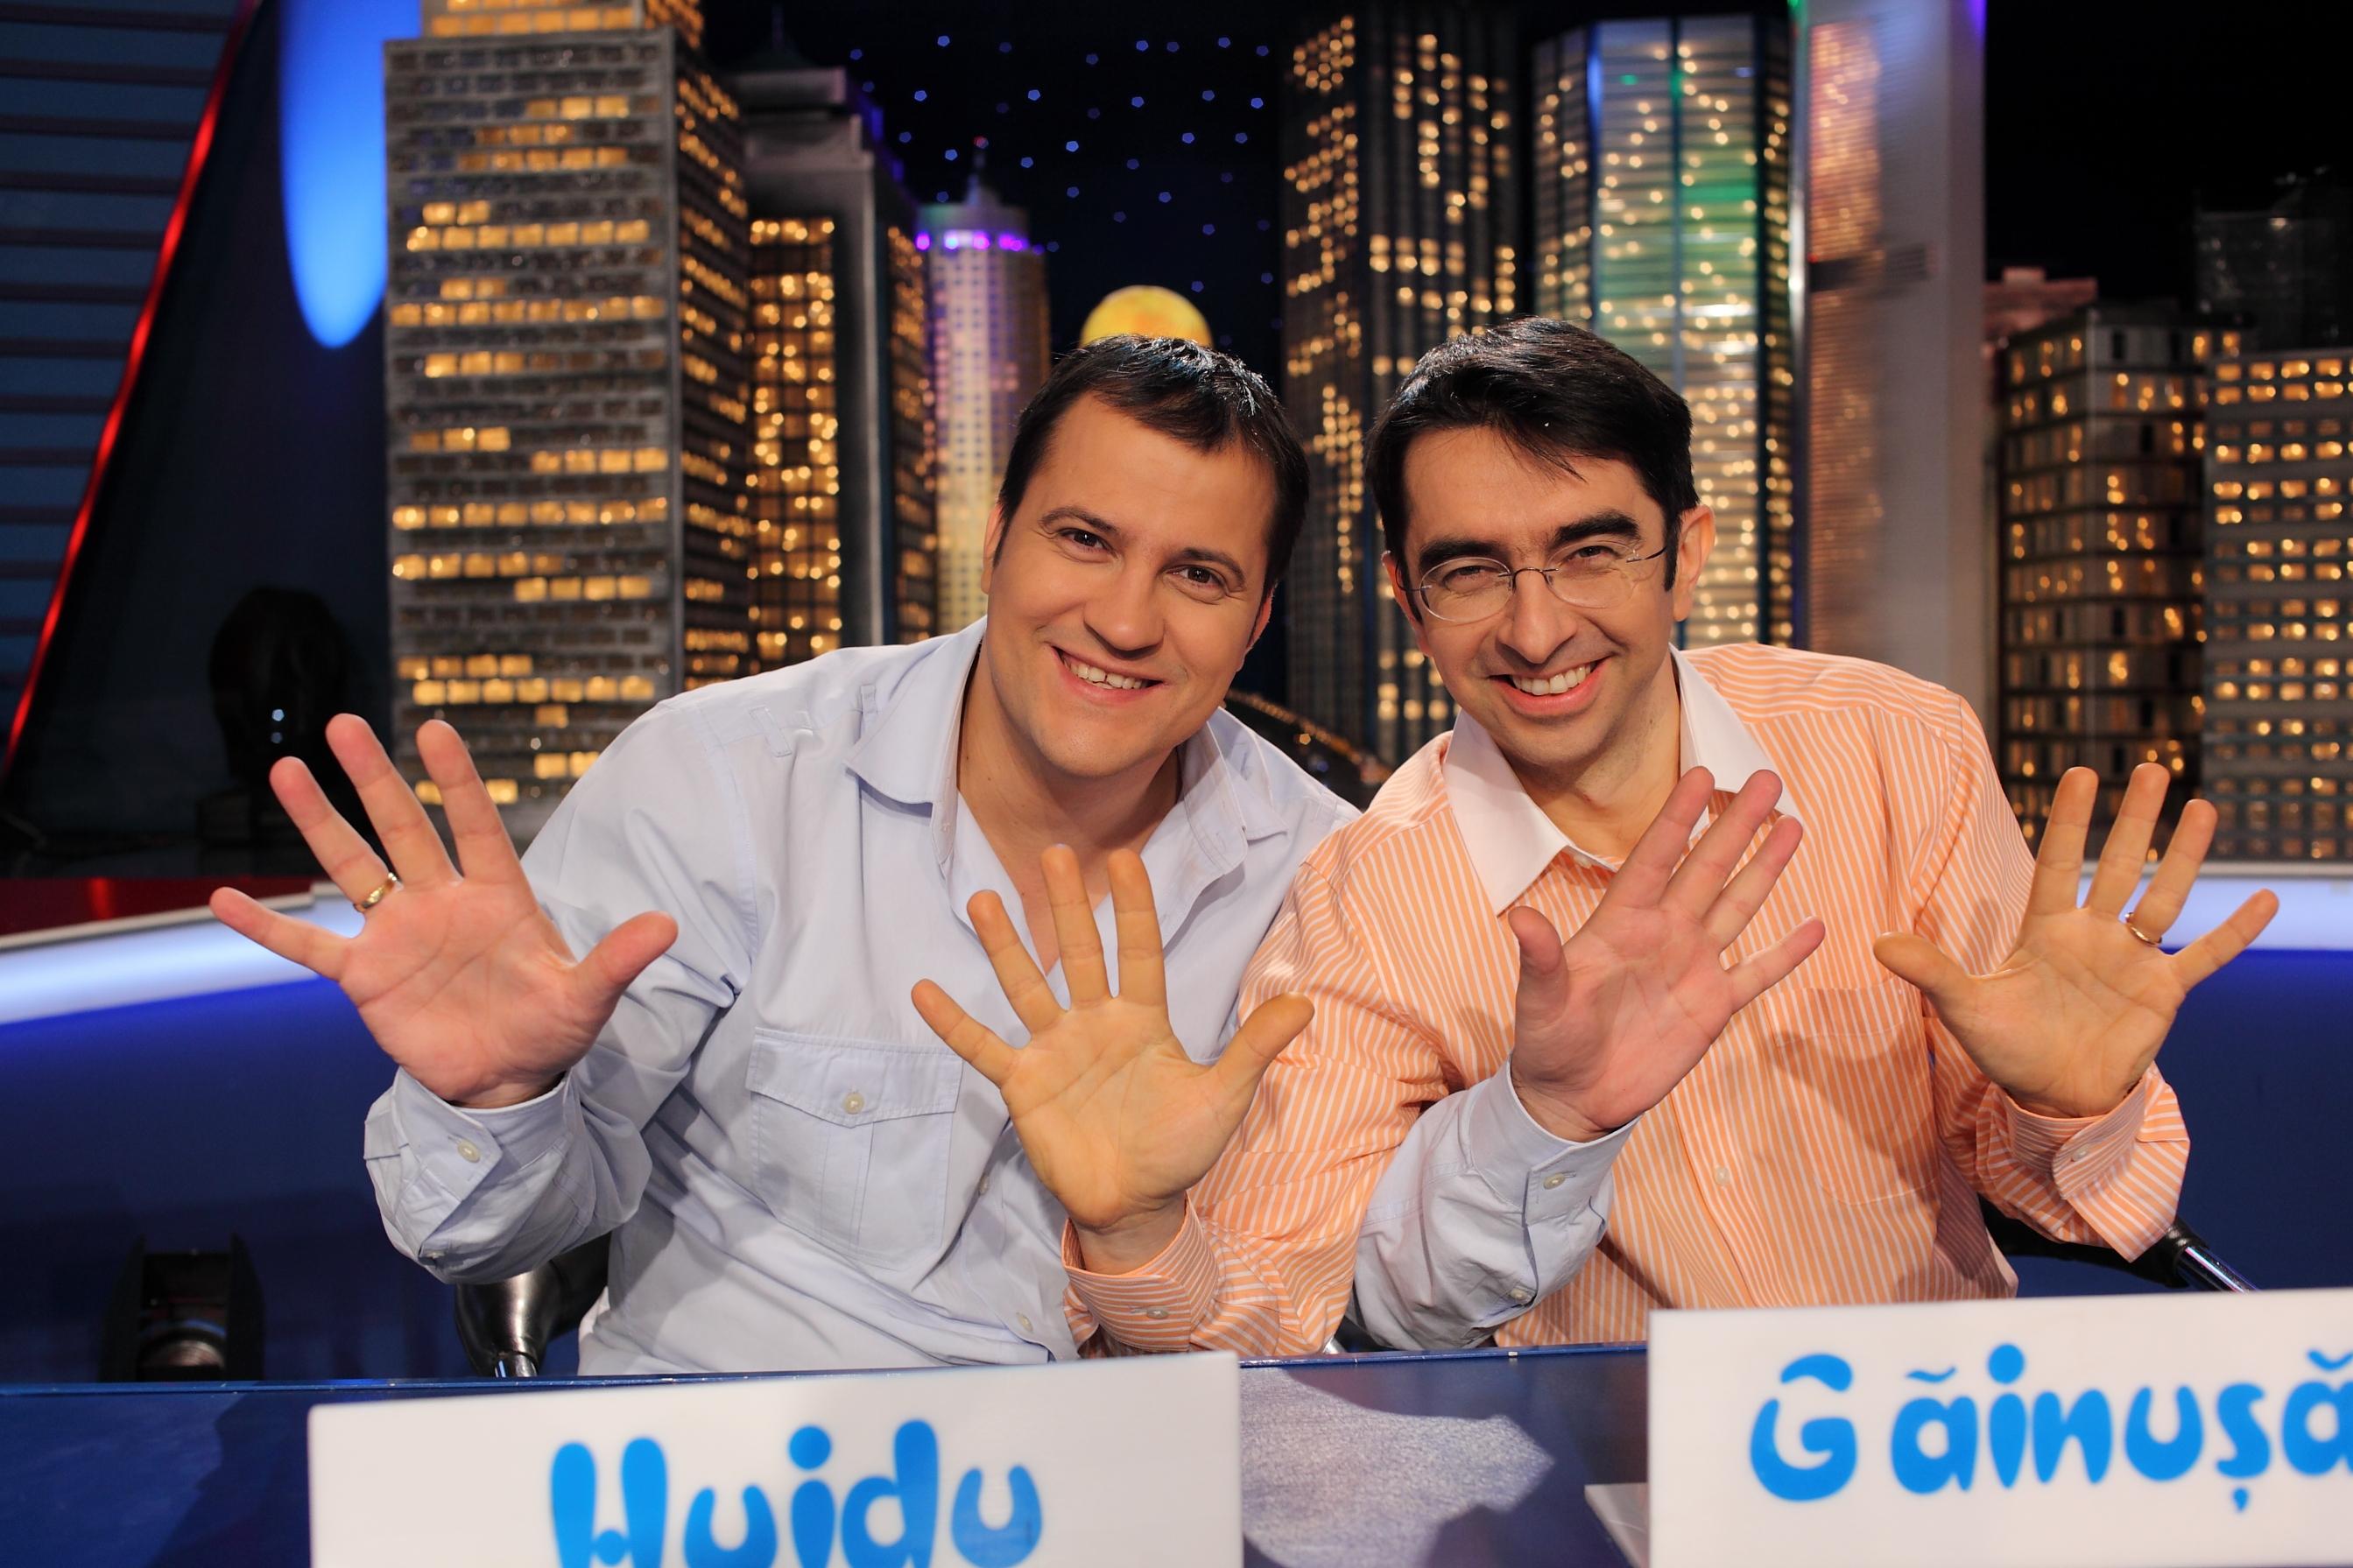 Ani la rand, Mihai Gainusa si Serban Huidu au fost cei mai buni prieteni